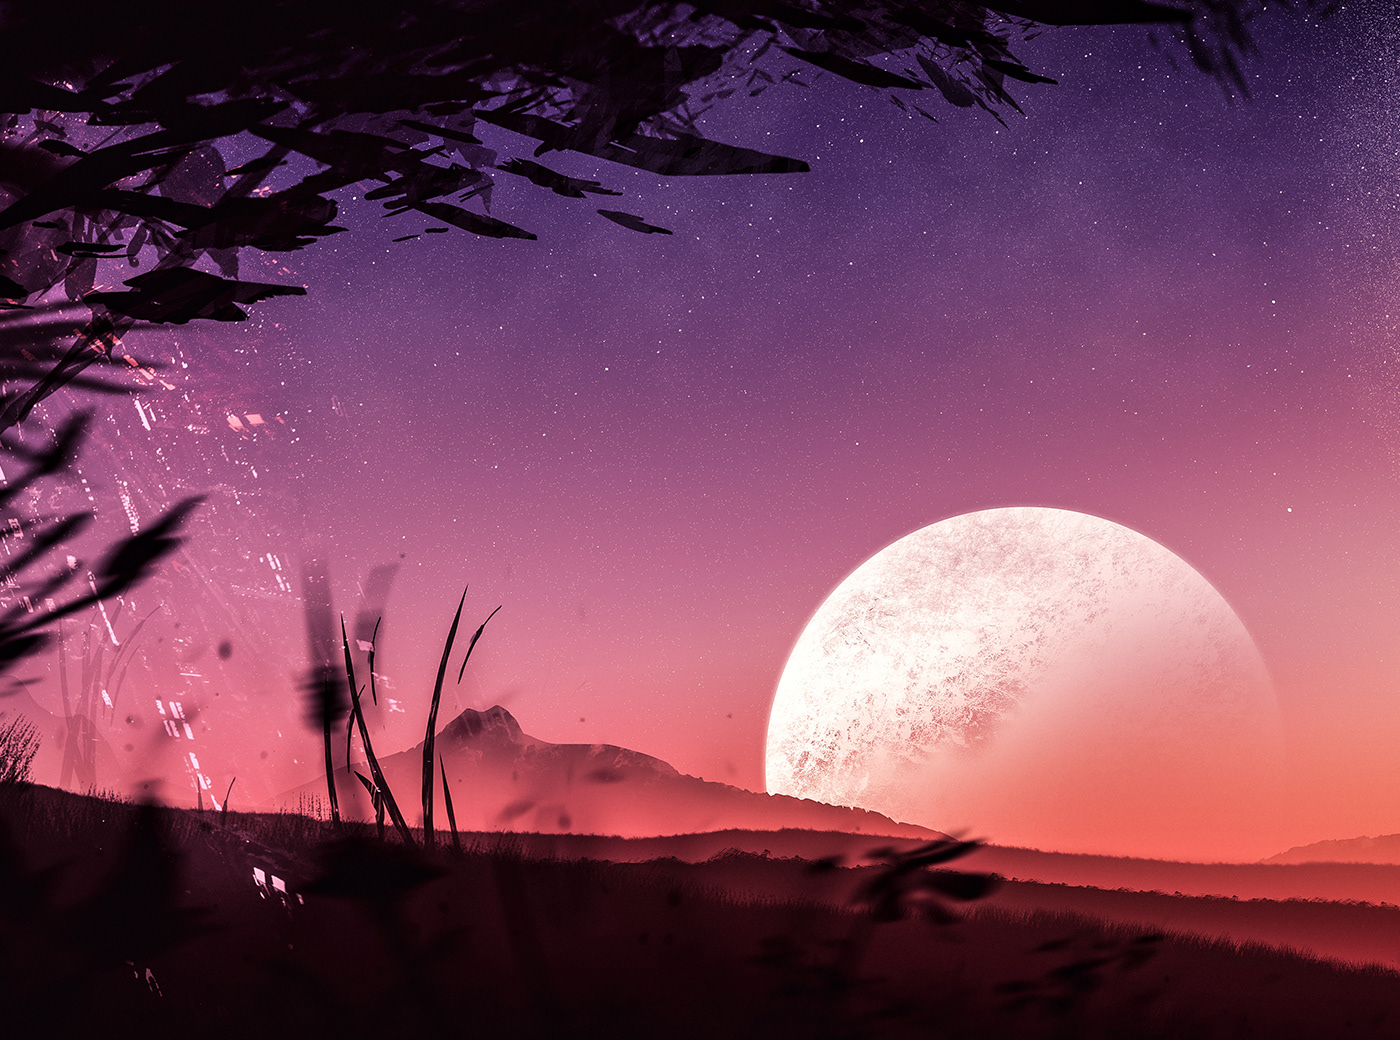 planet SKY Space  stars Landscape artwork